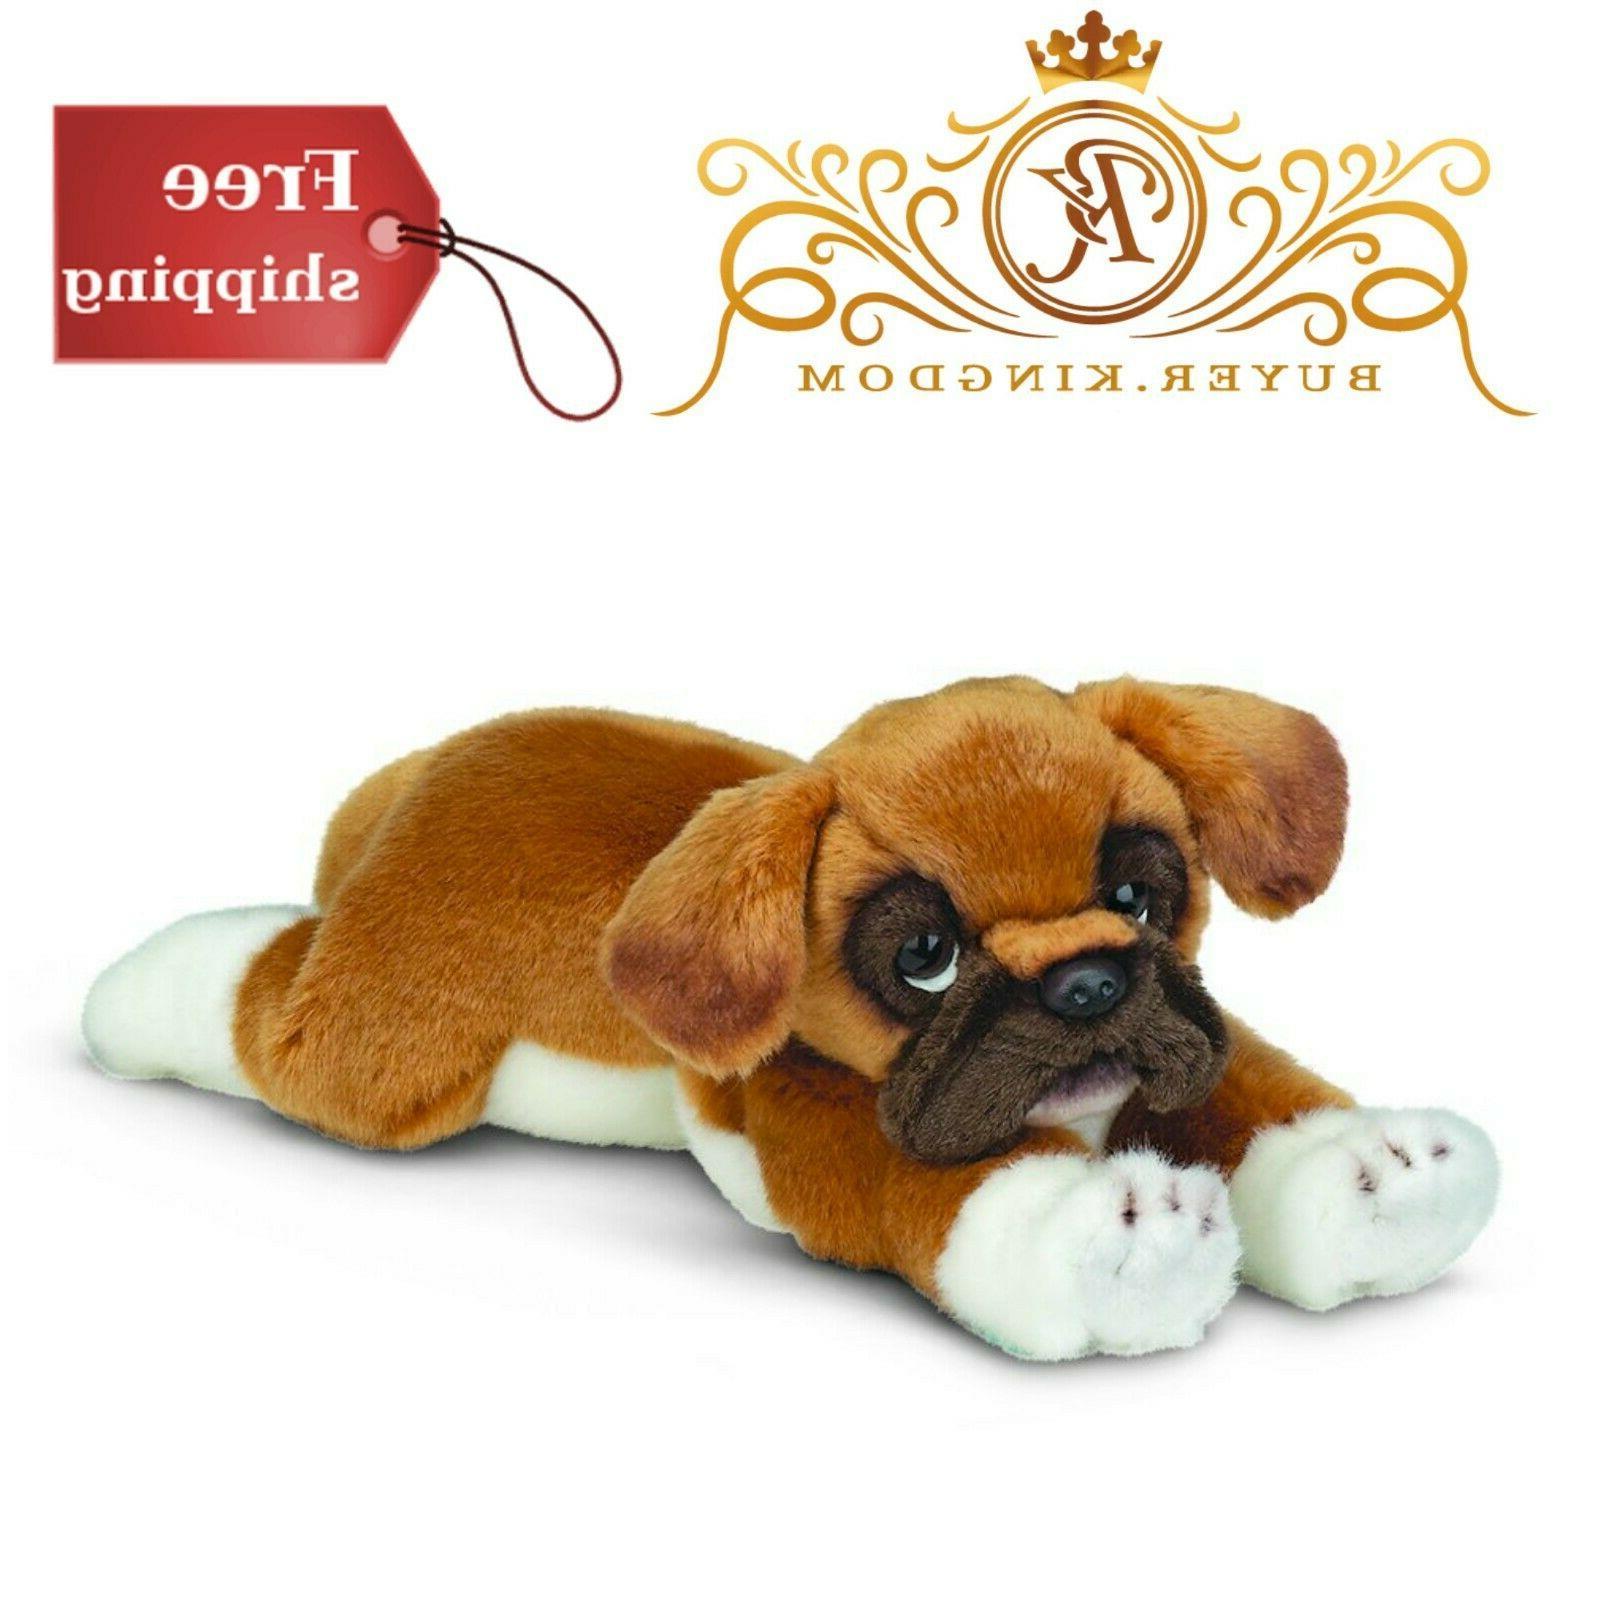 stuffed toy puppy dog roscoe boxer kitten